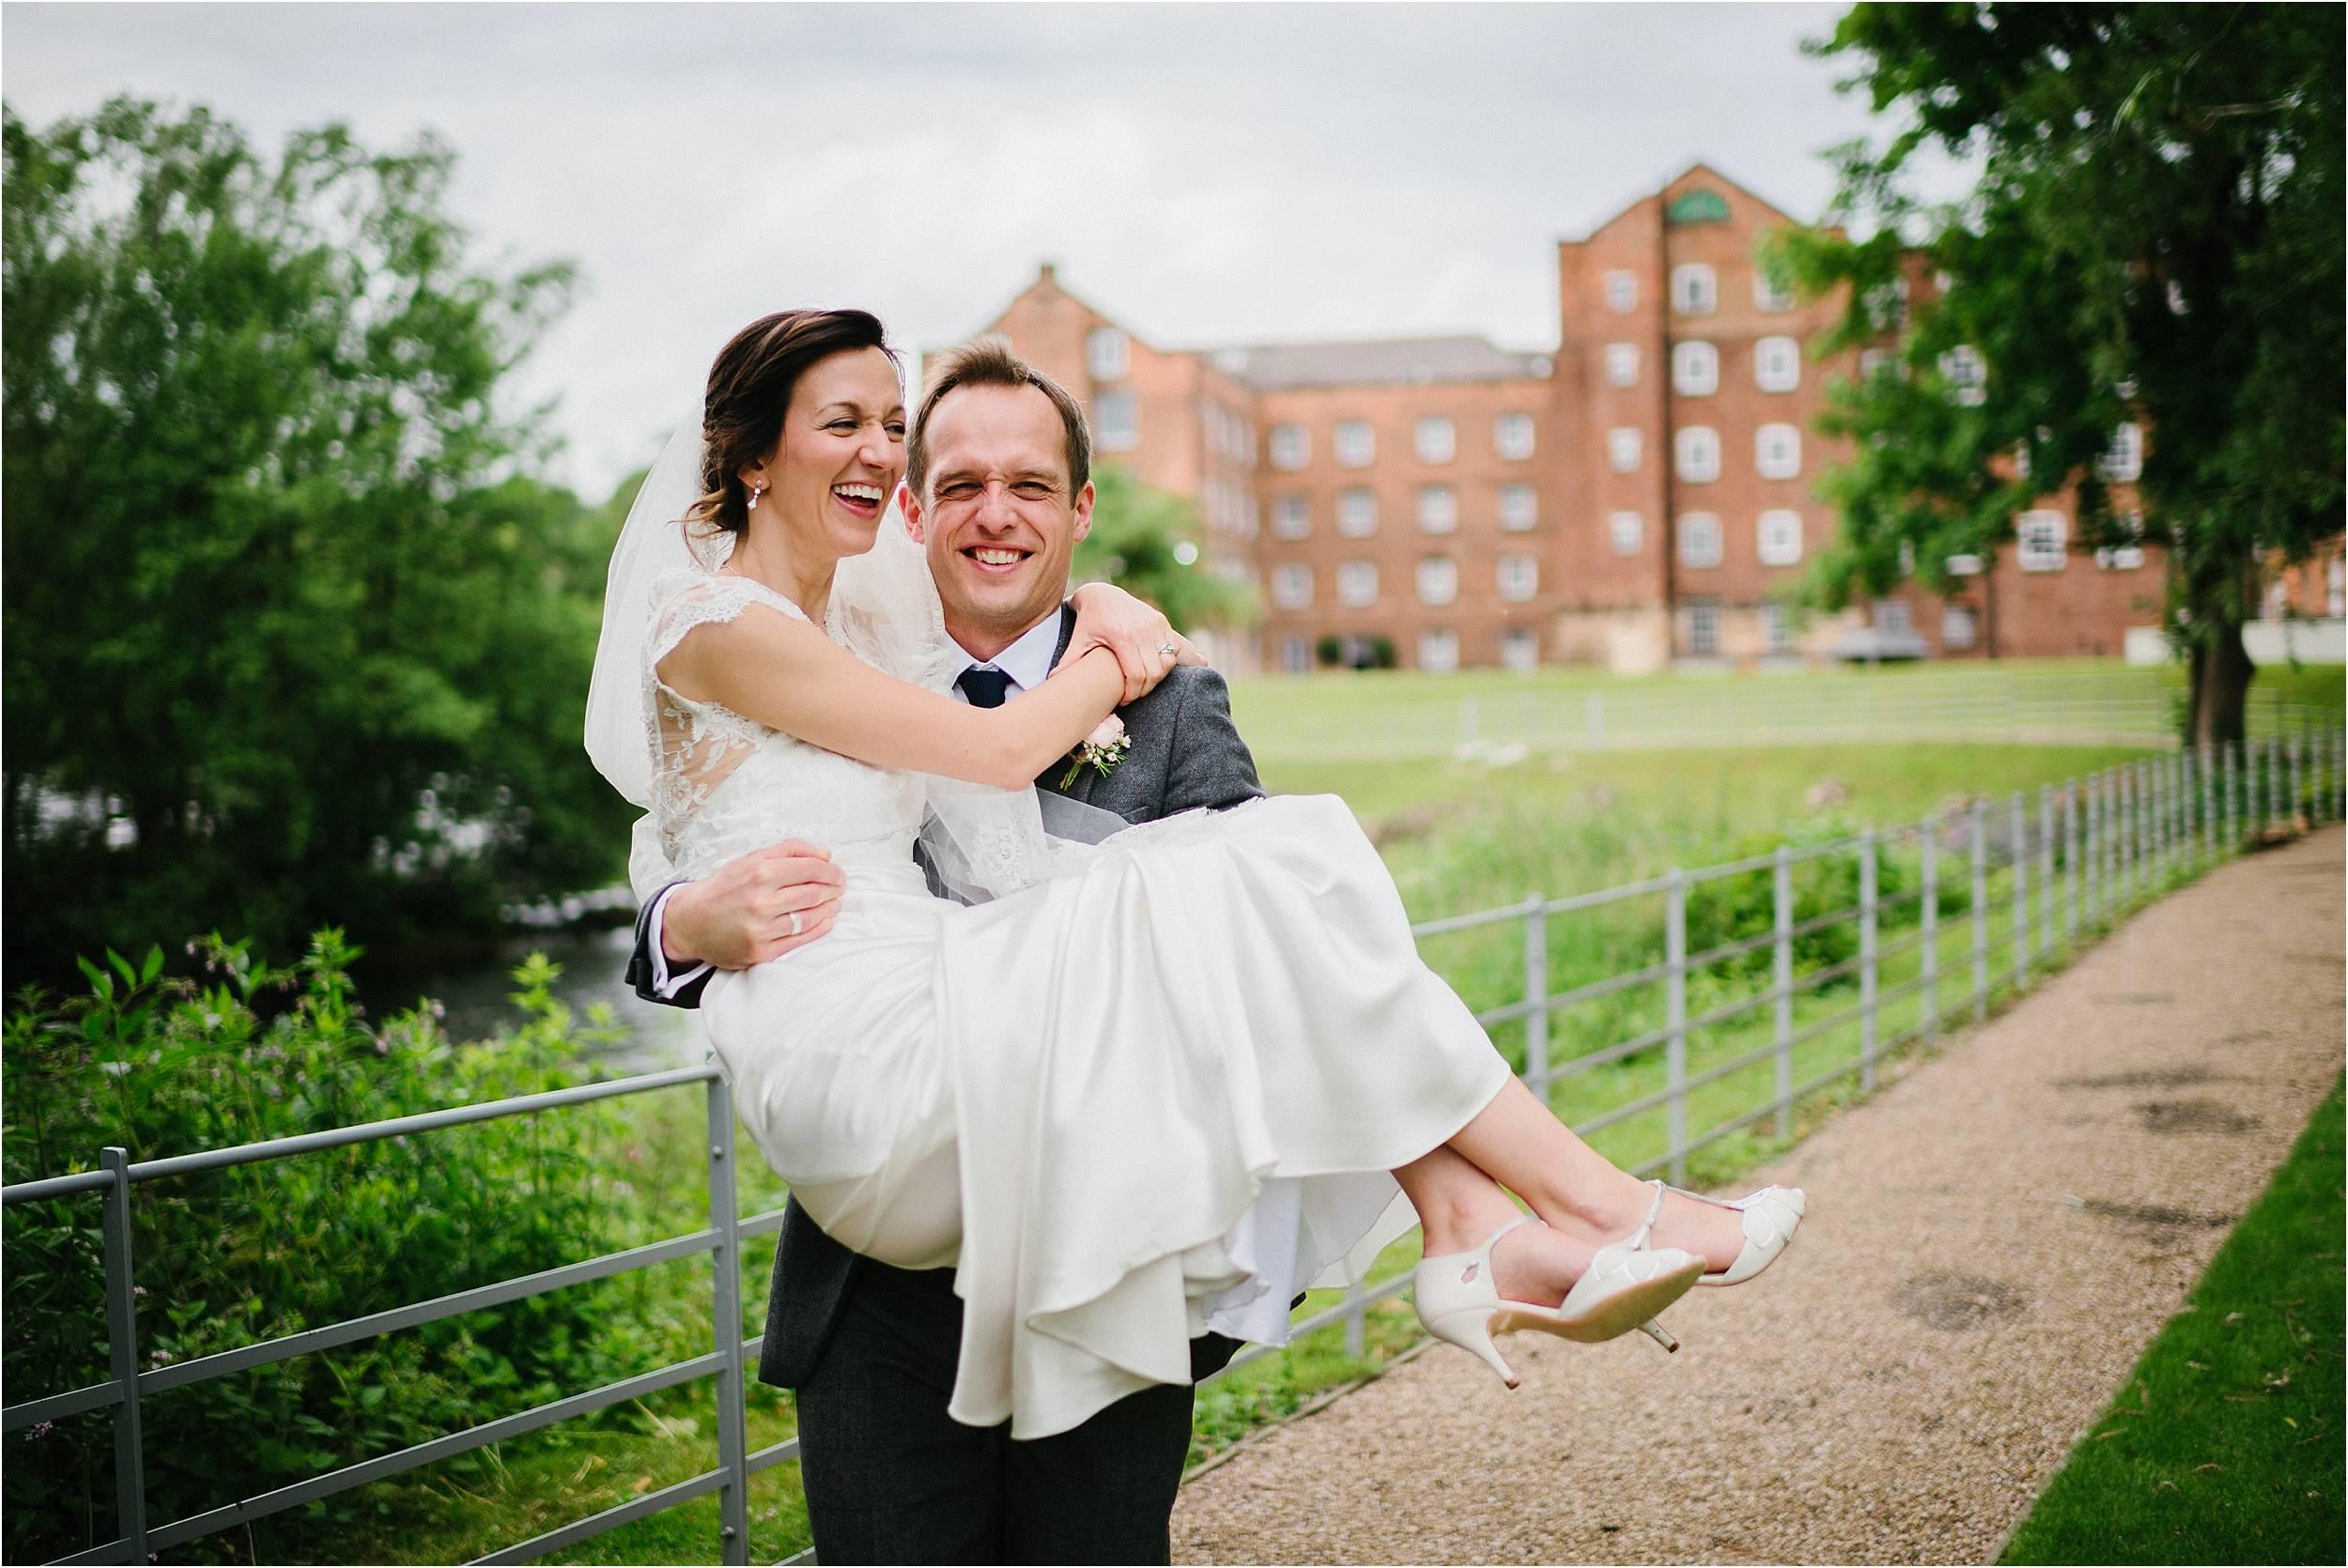 West Mill Derby Wedding Photographer_0154.jpg